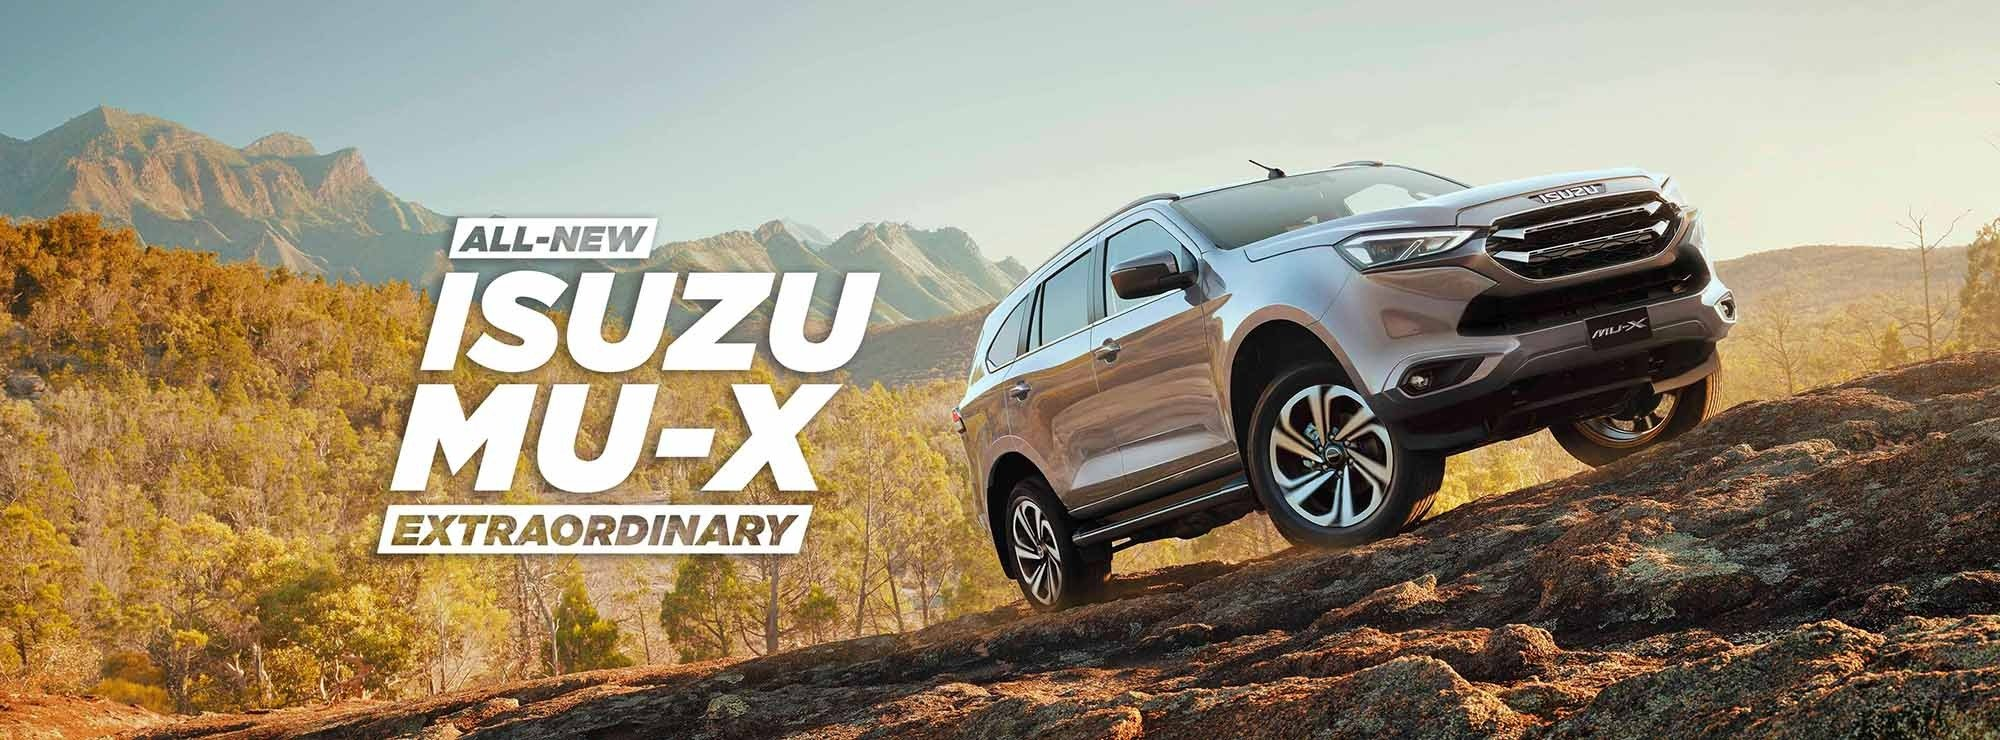 all-new-isuzu-mux-2021